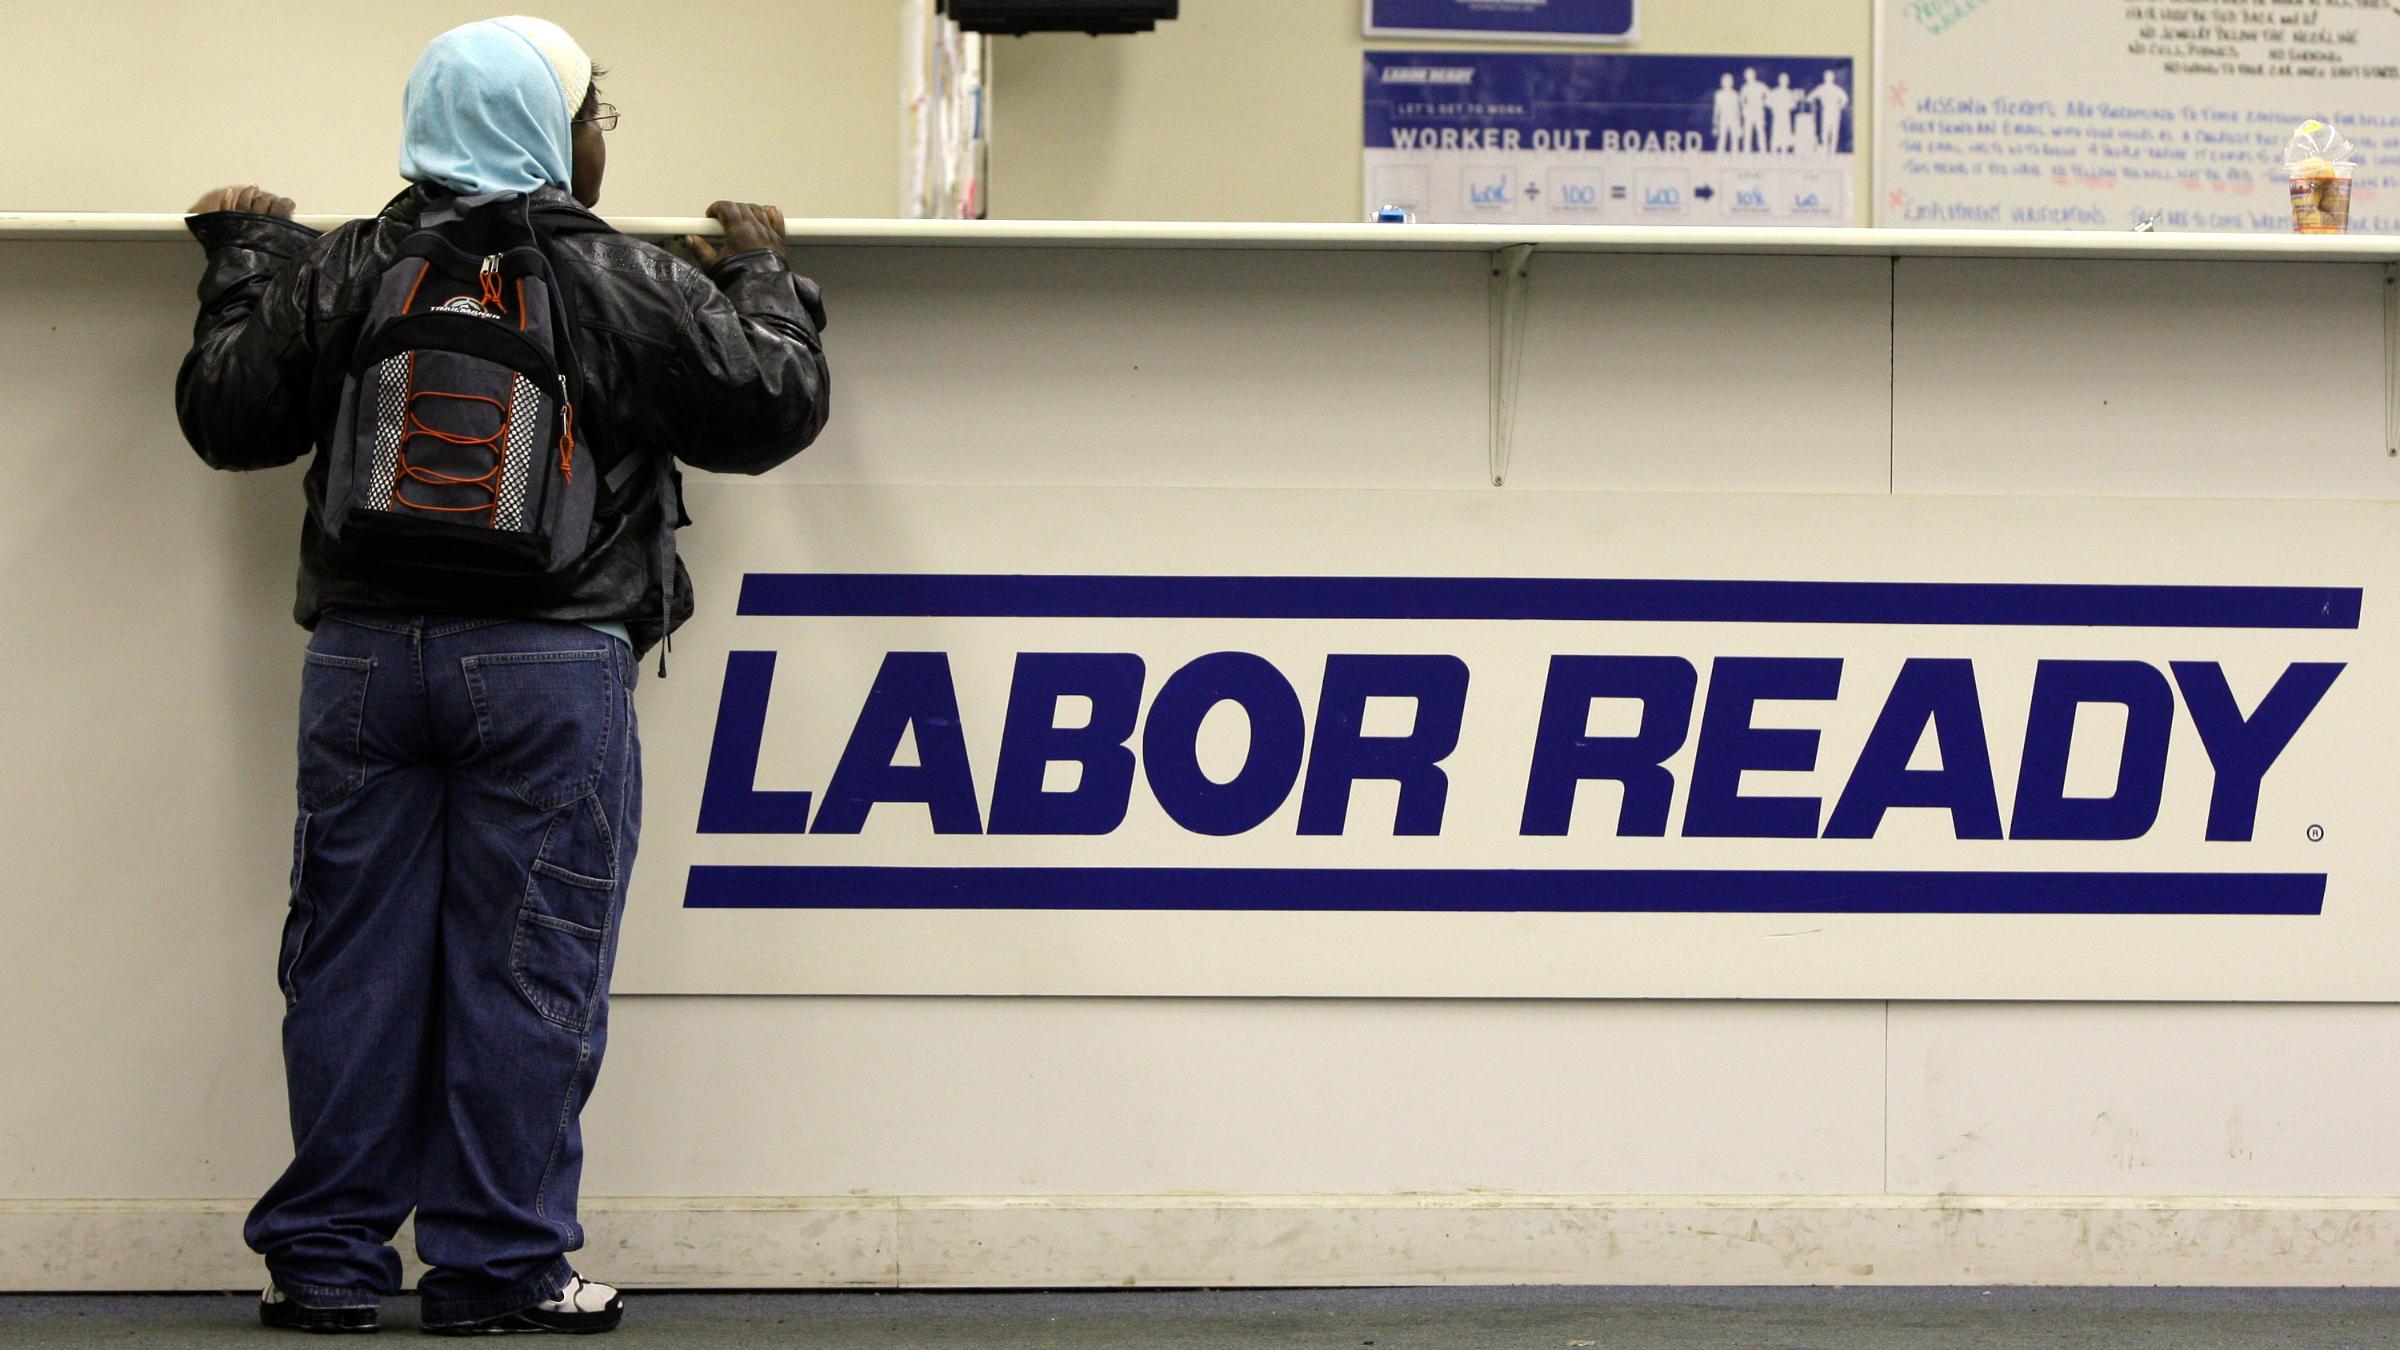 Labor Ready temporary employment agency.